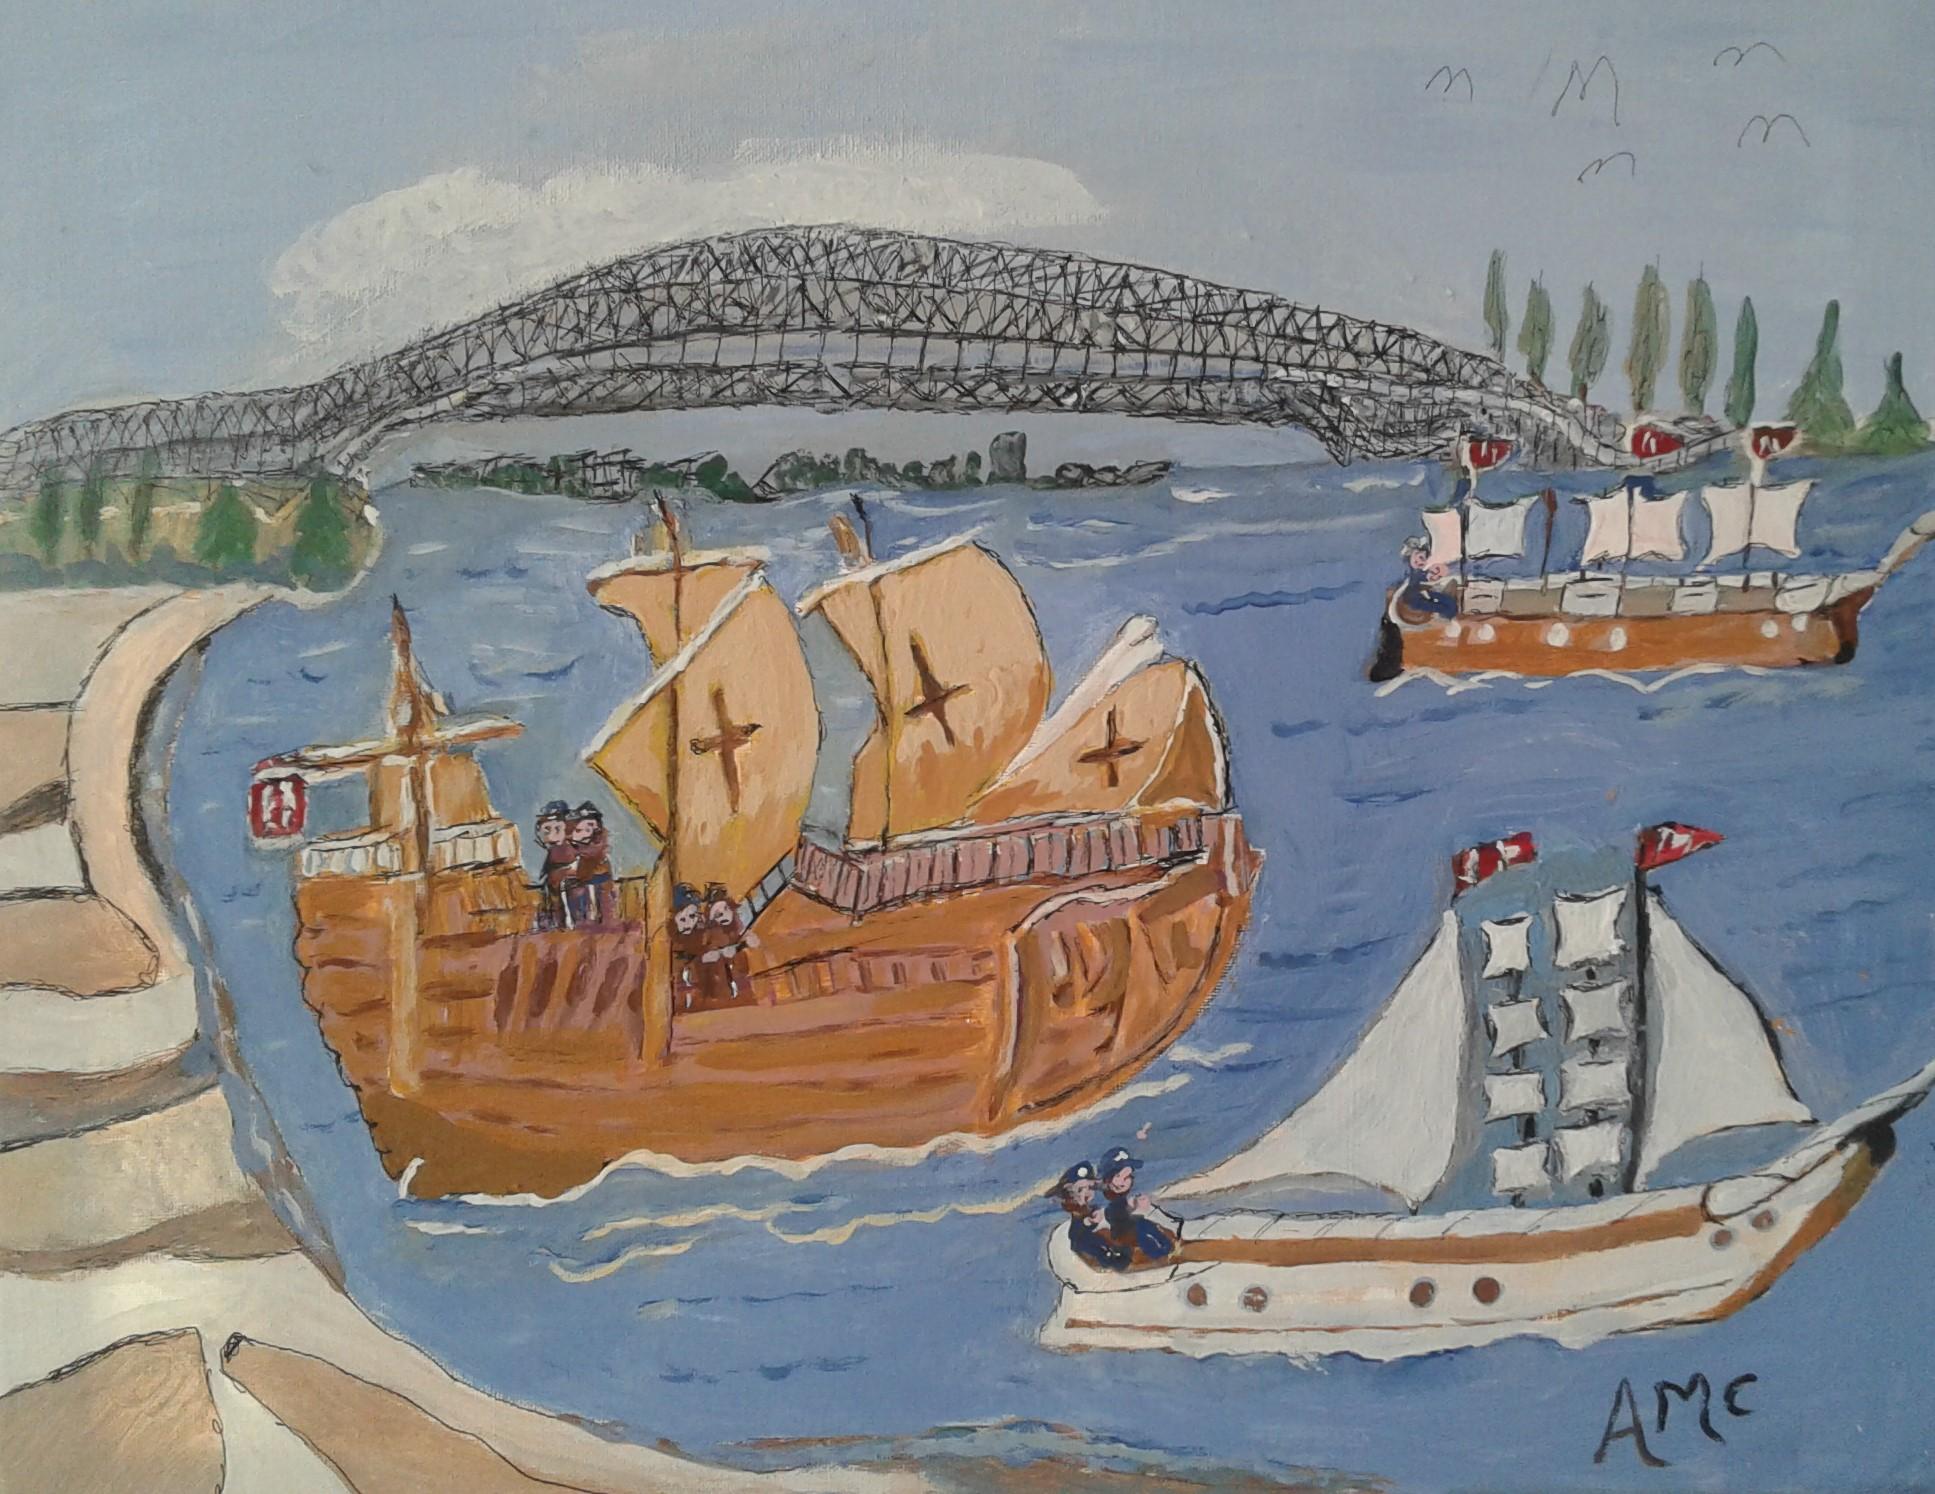 The Tall Ships - AMc - 2020